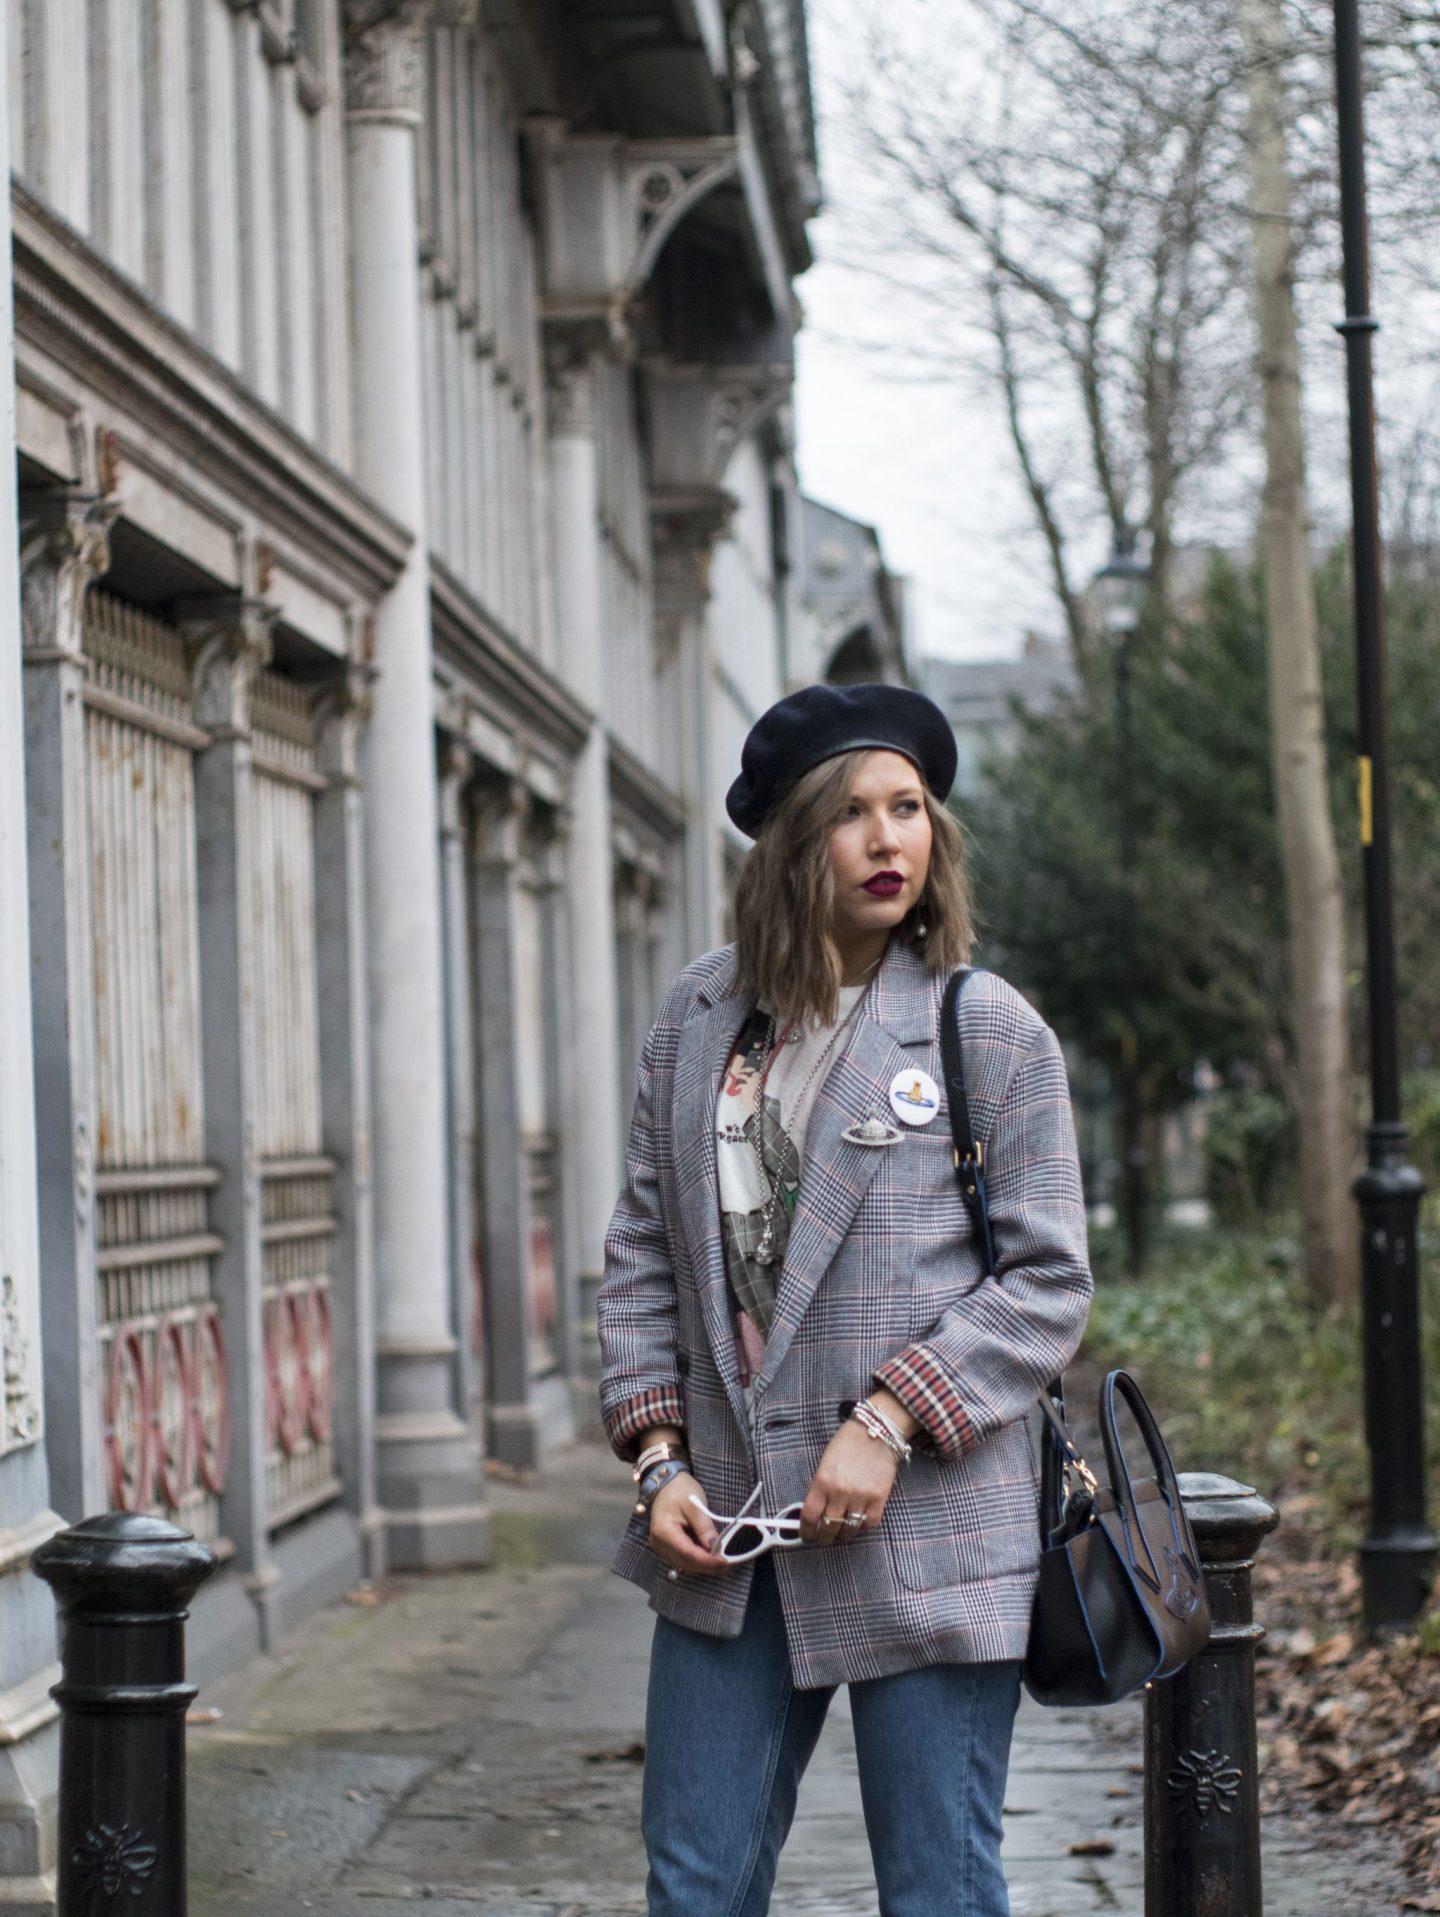 manchester fashion blogger, check blazer , tiny sunglasses, vivinne westwood bag, beret, check blazer, zara blazer